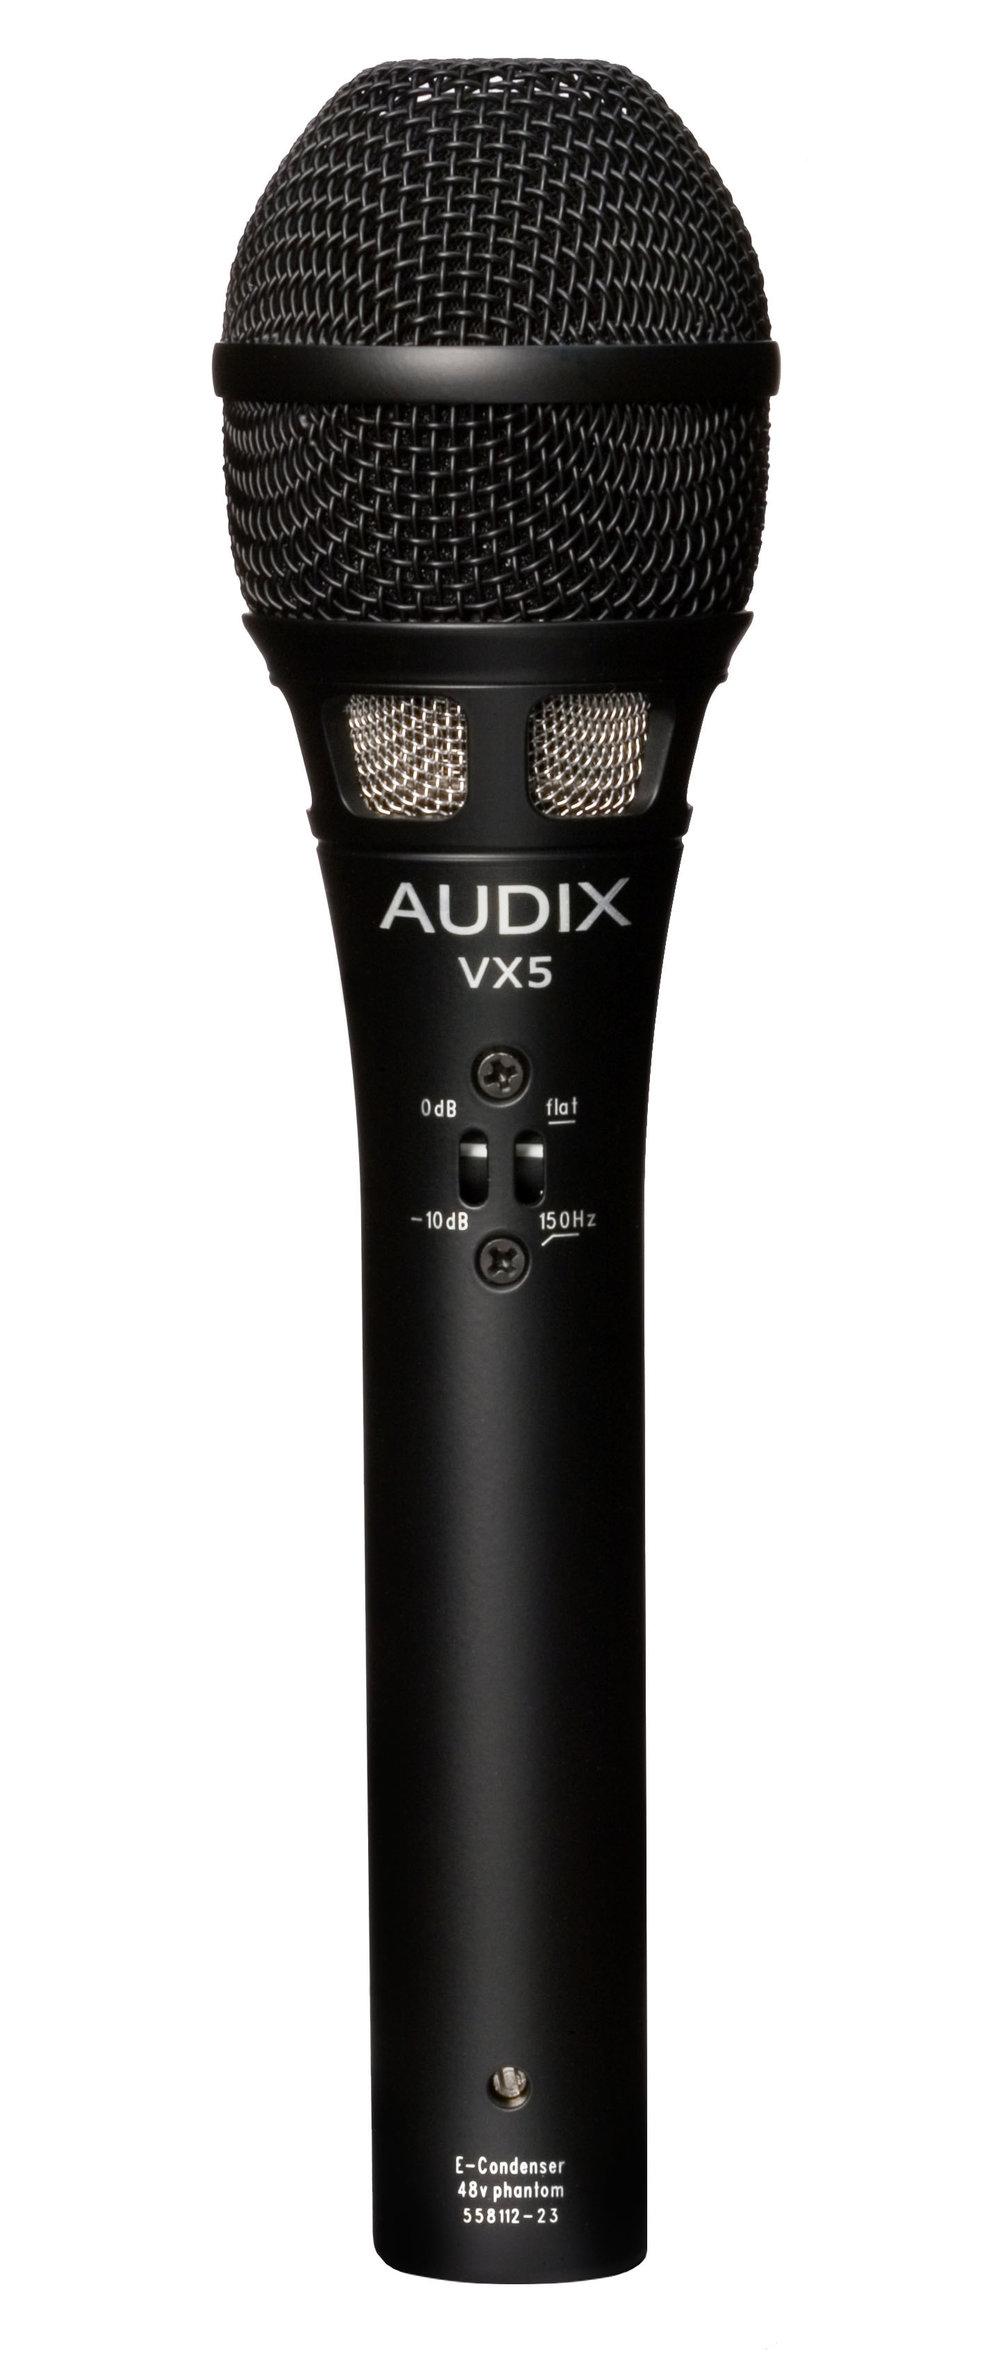 Audio VX5